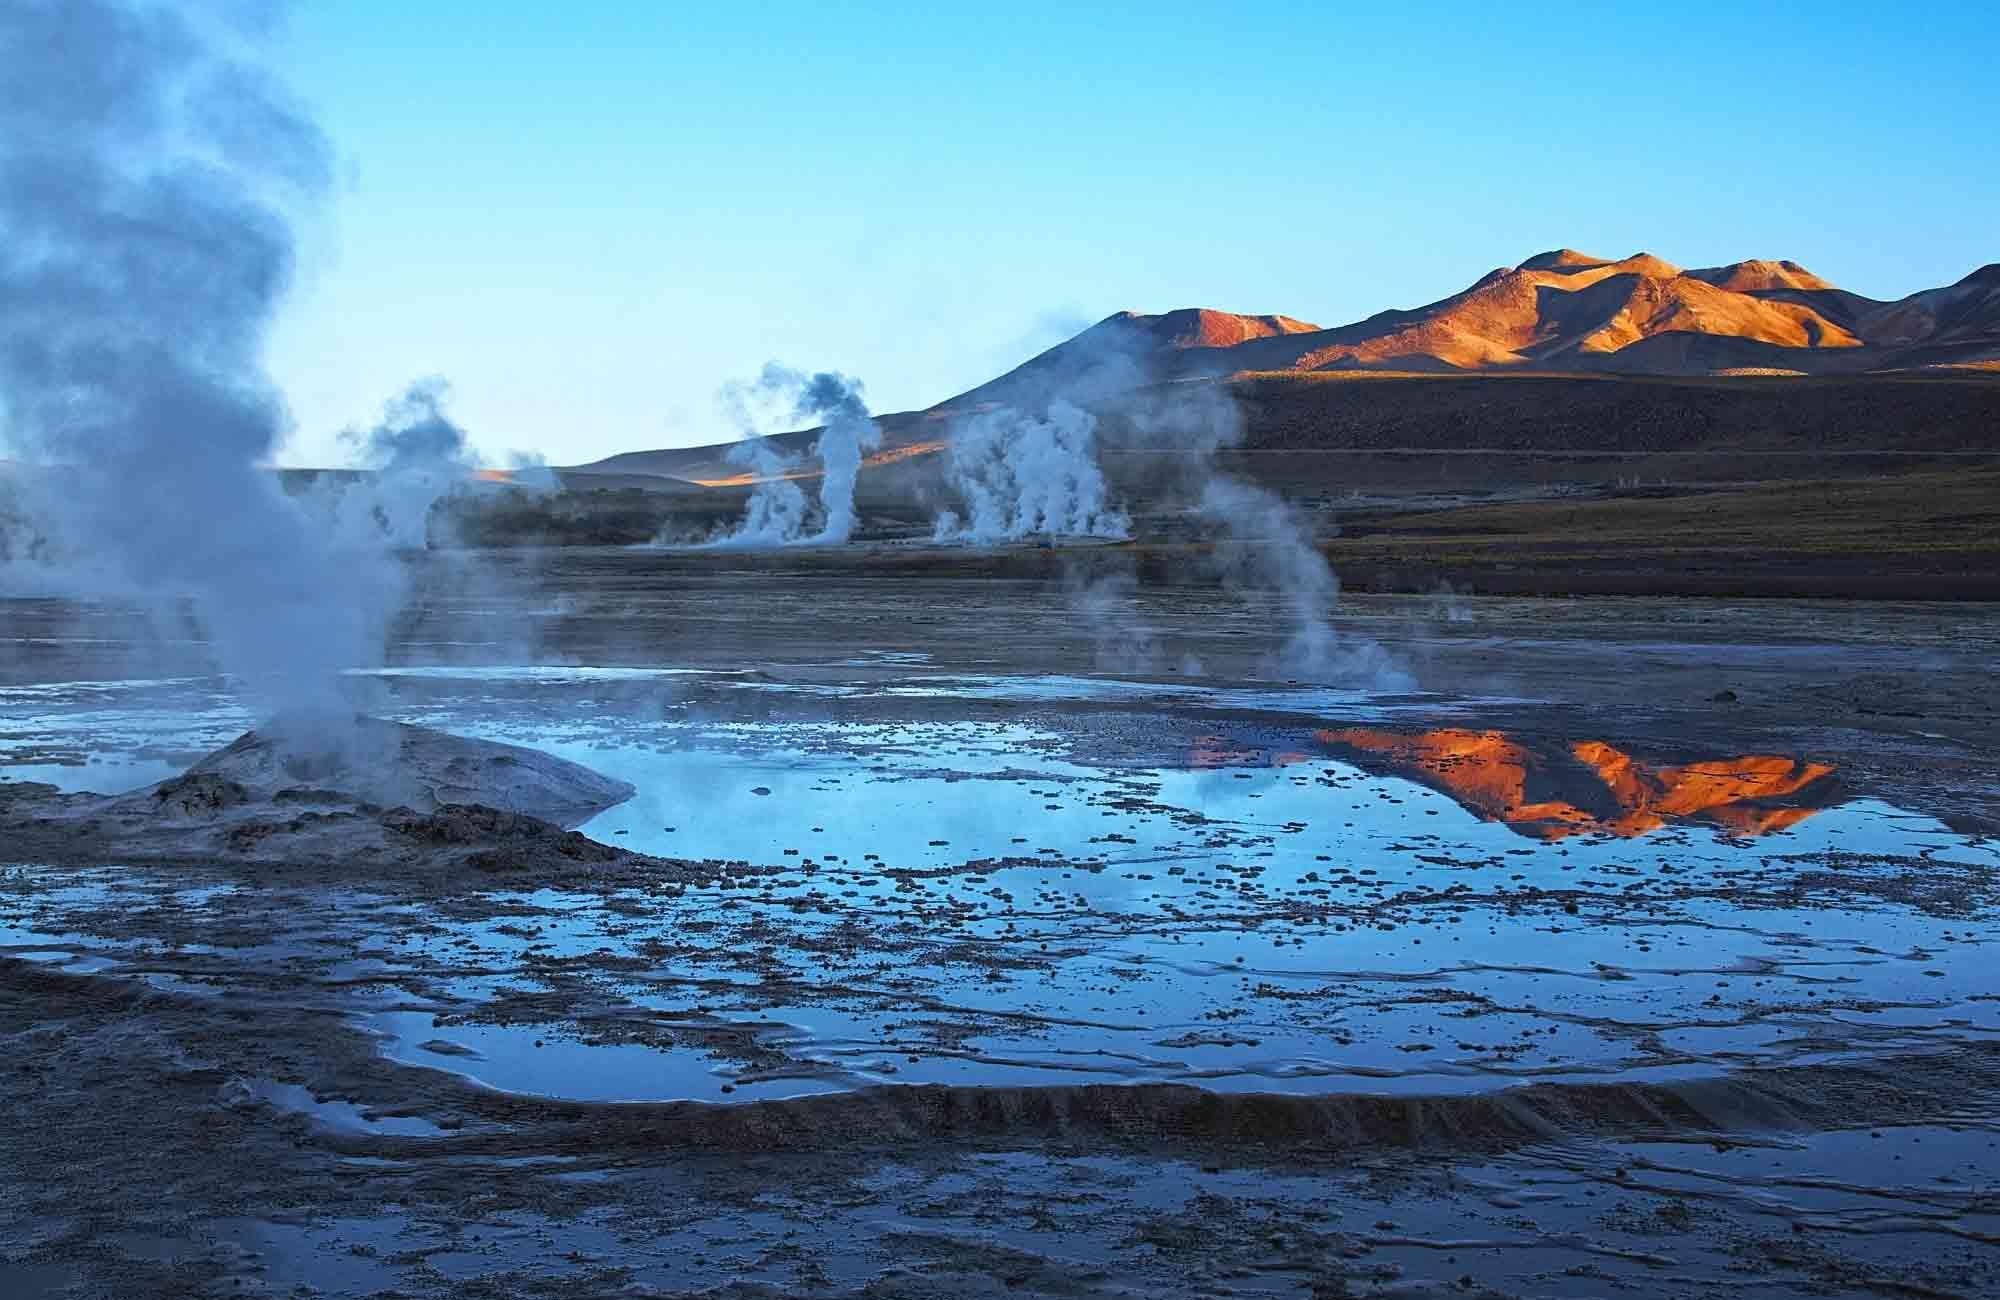 Voyage Chili - Geysers du Tatio Atacama - Amplitudes